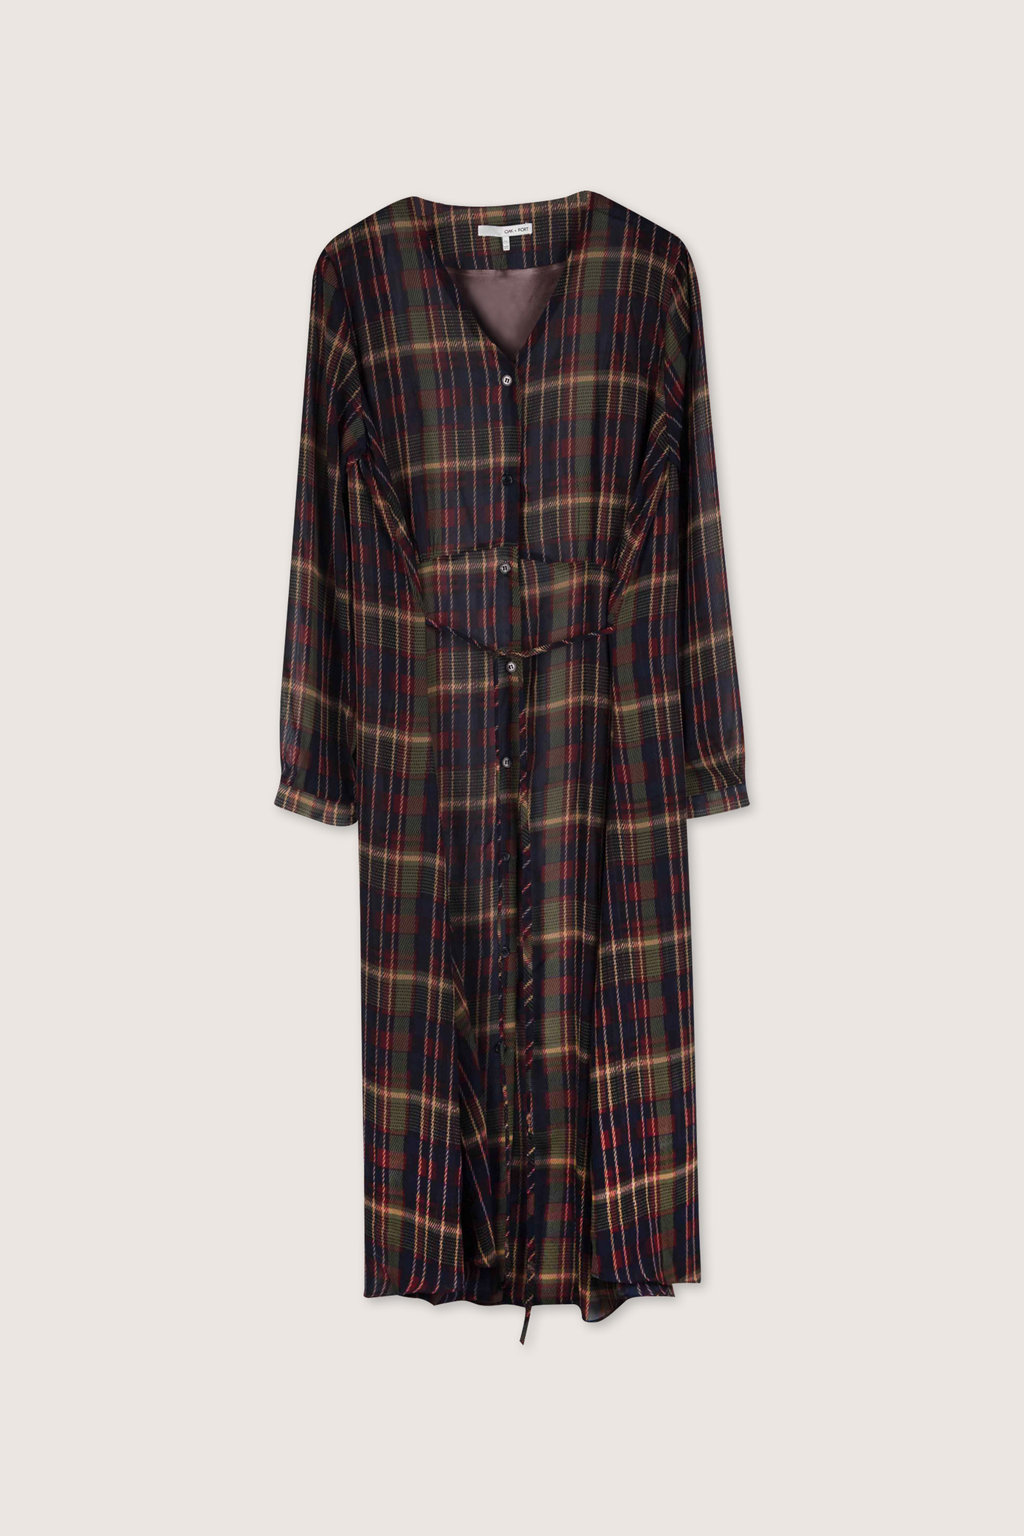 Dress H337 Olive 5